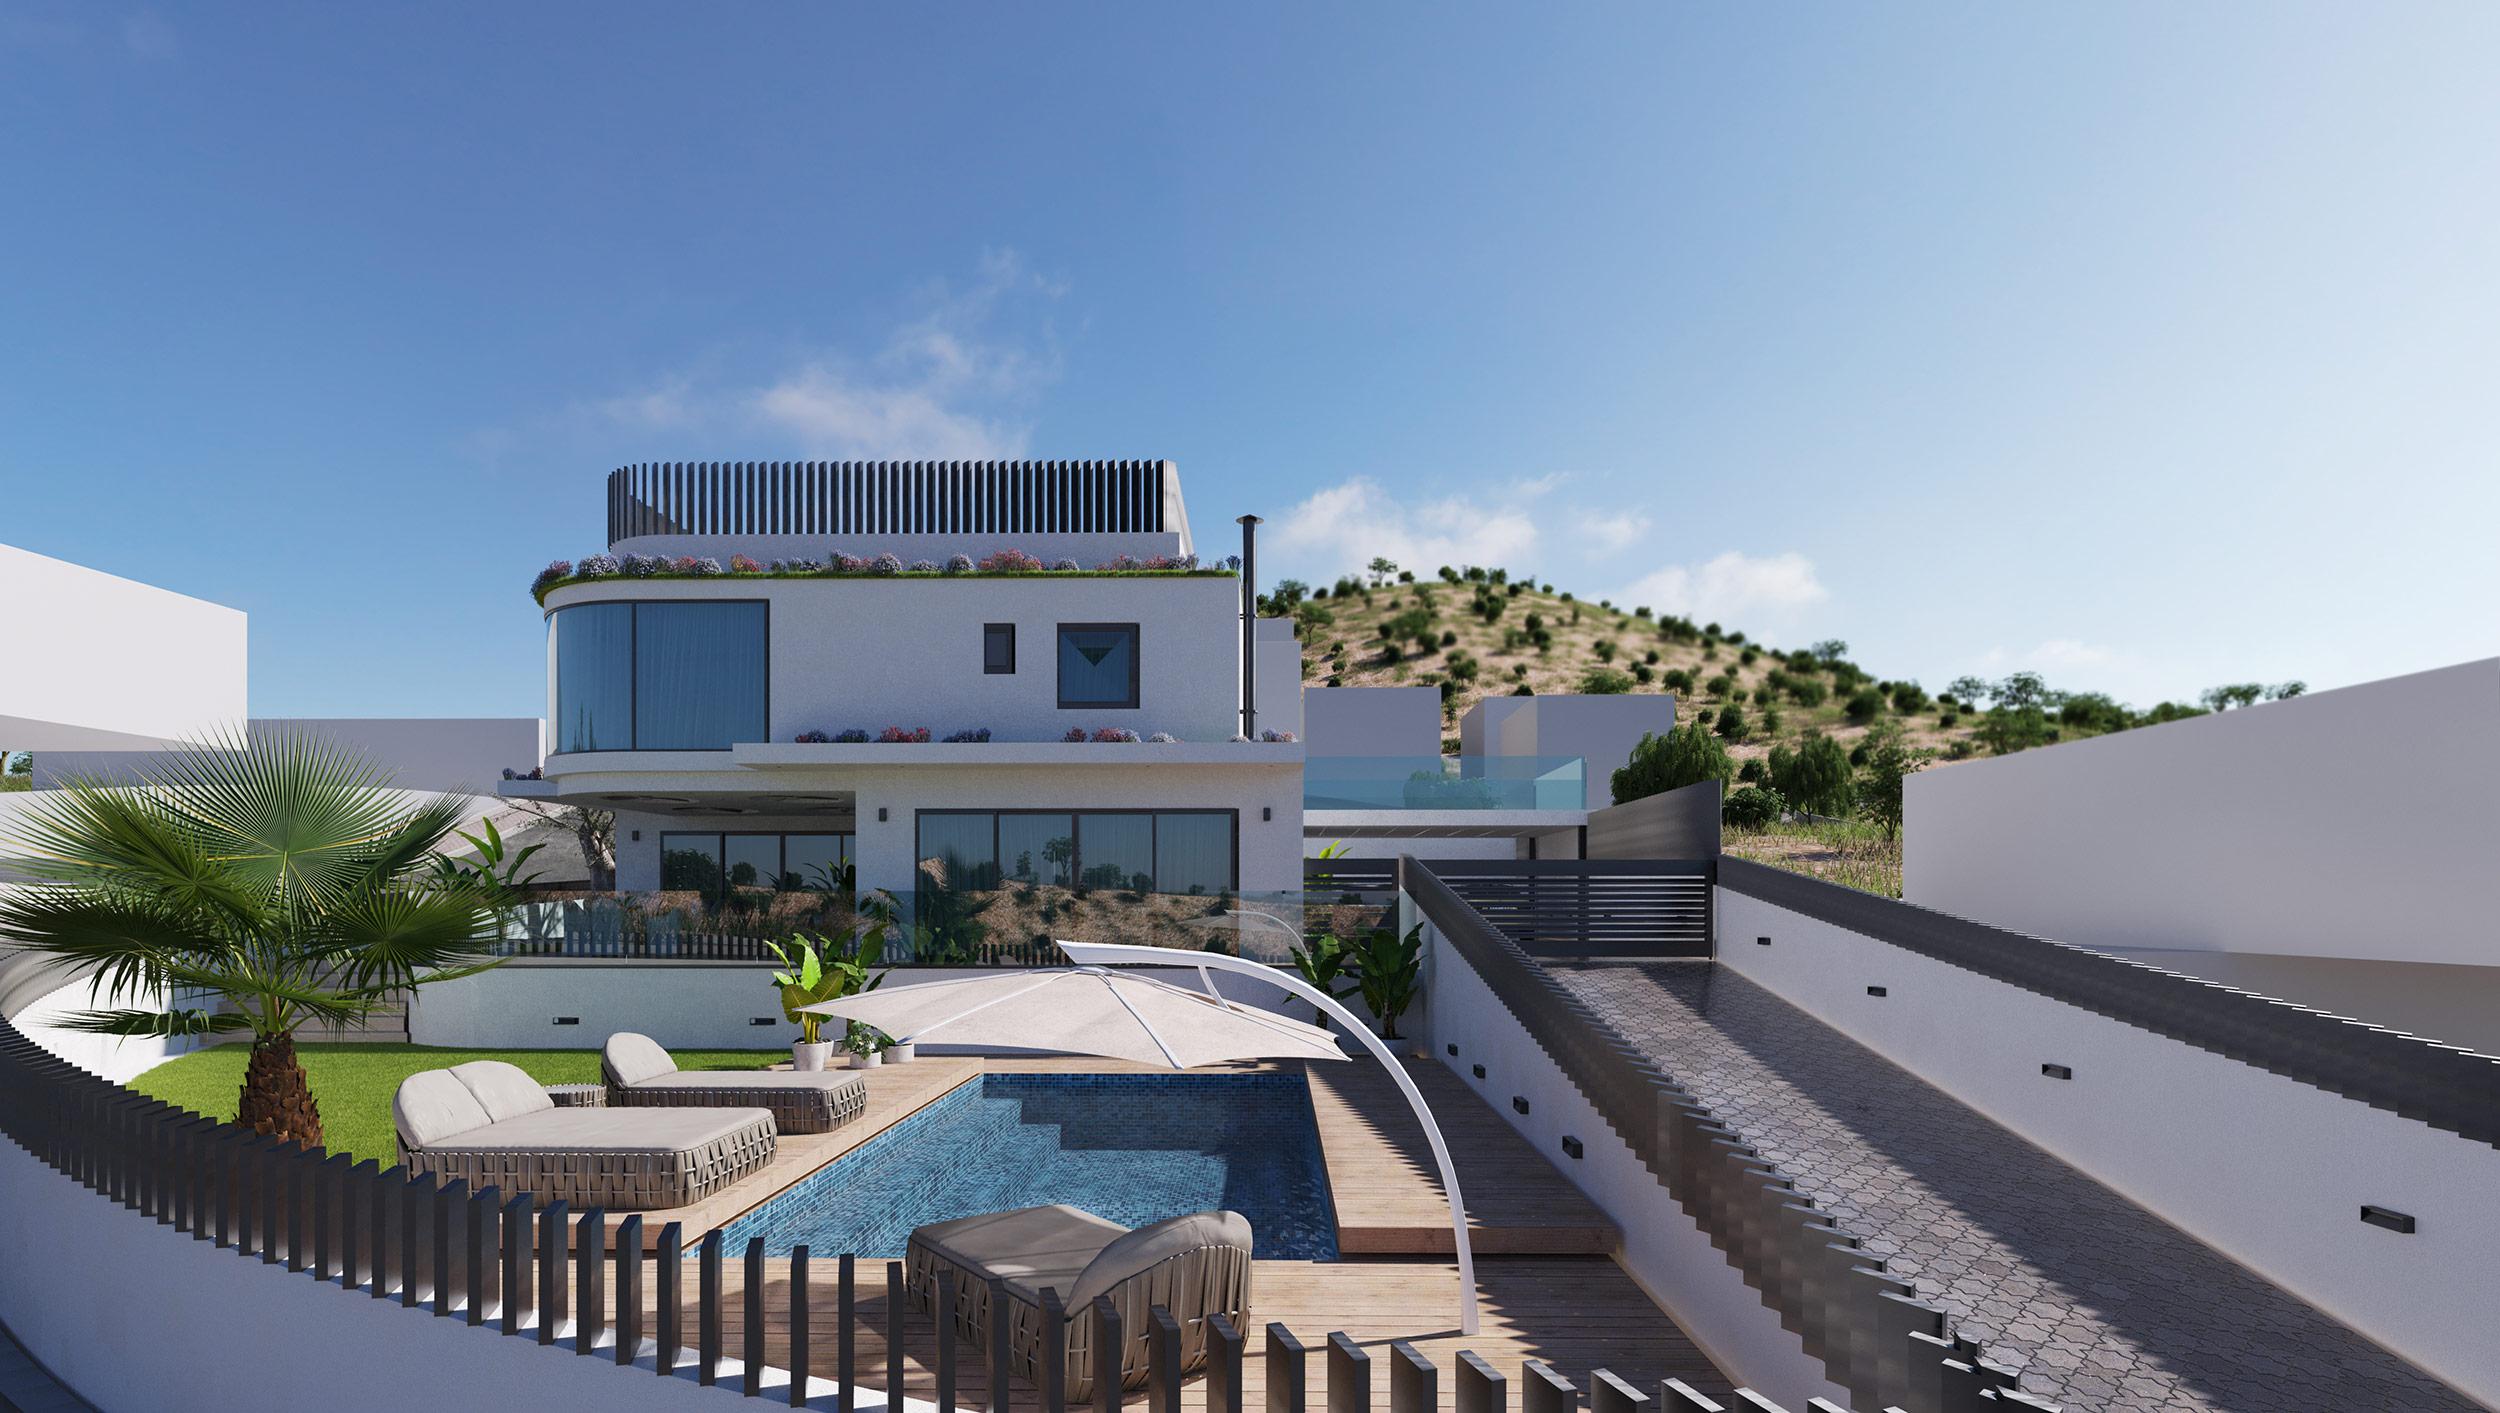 https://www.atelierzoz.com/wp-content/uploads/2020/12/atelierzoz-meadowview-villa-3.jpg